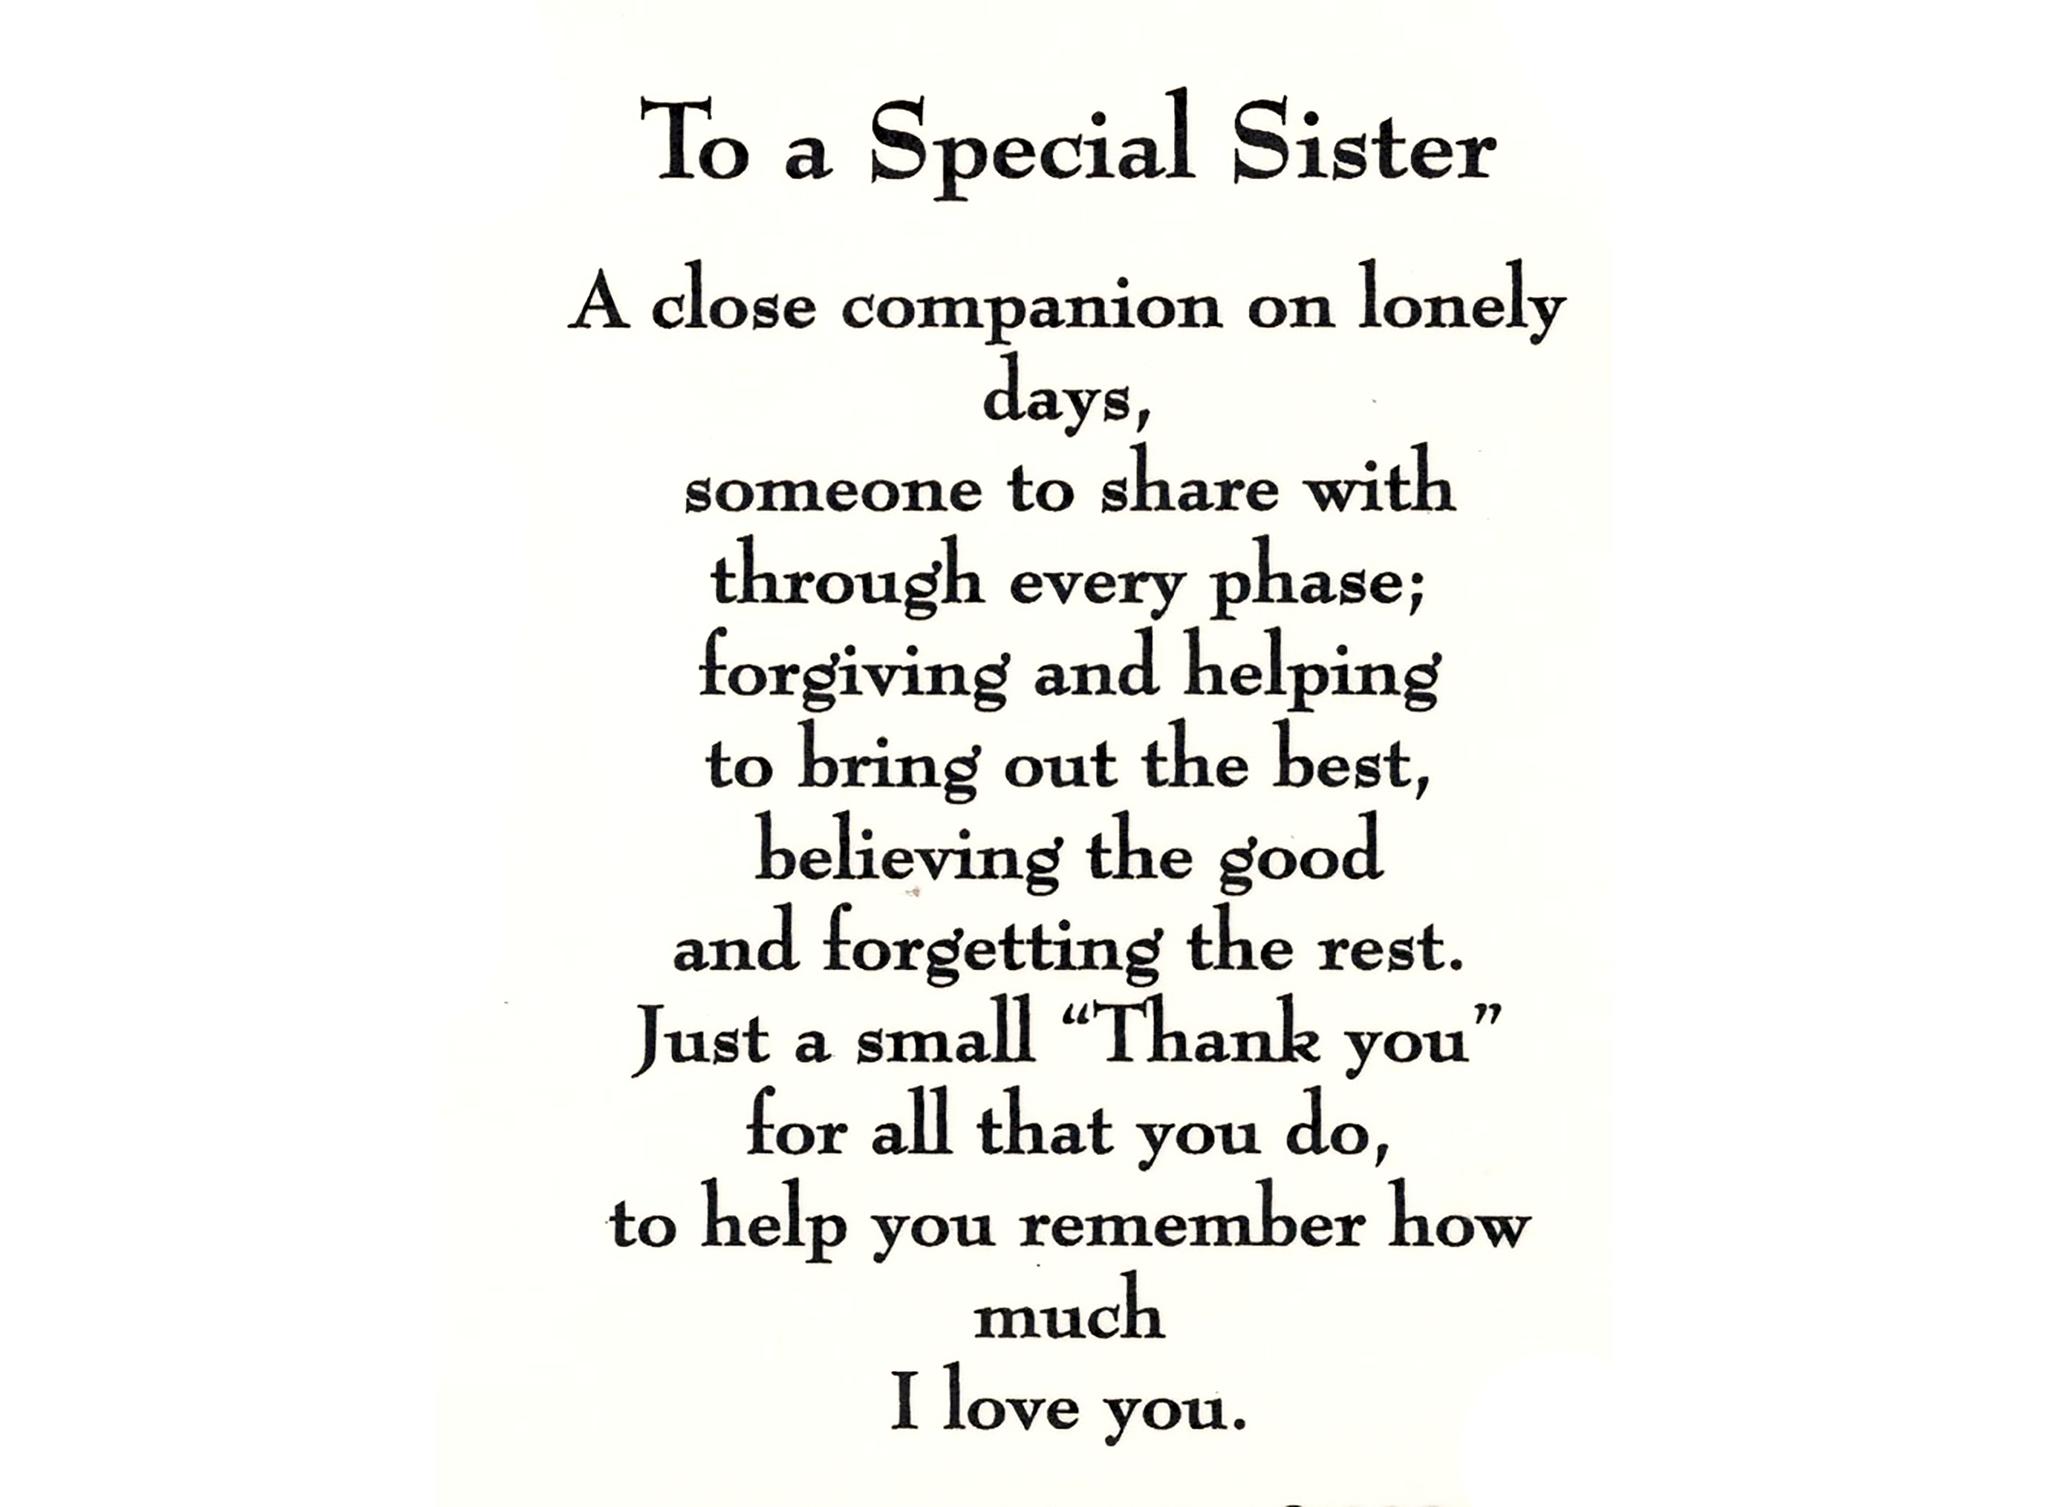 Older Sister Birthday Card Funny Birthday Card Joke Card